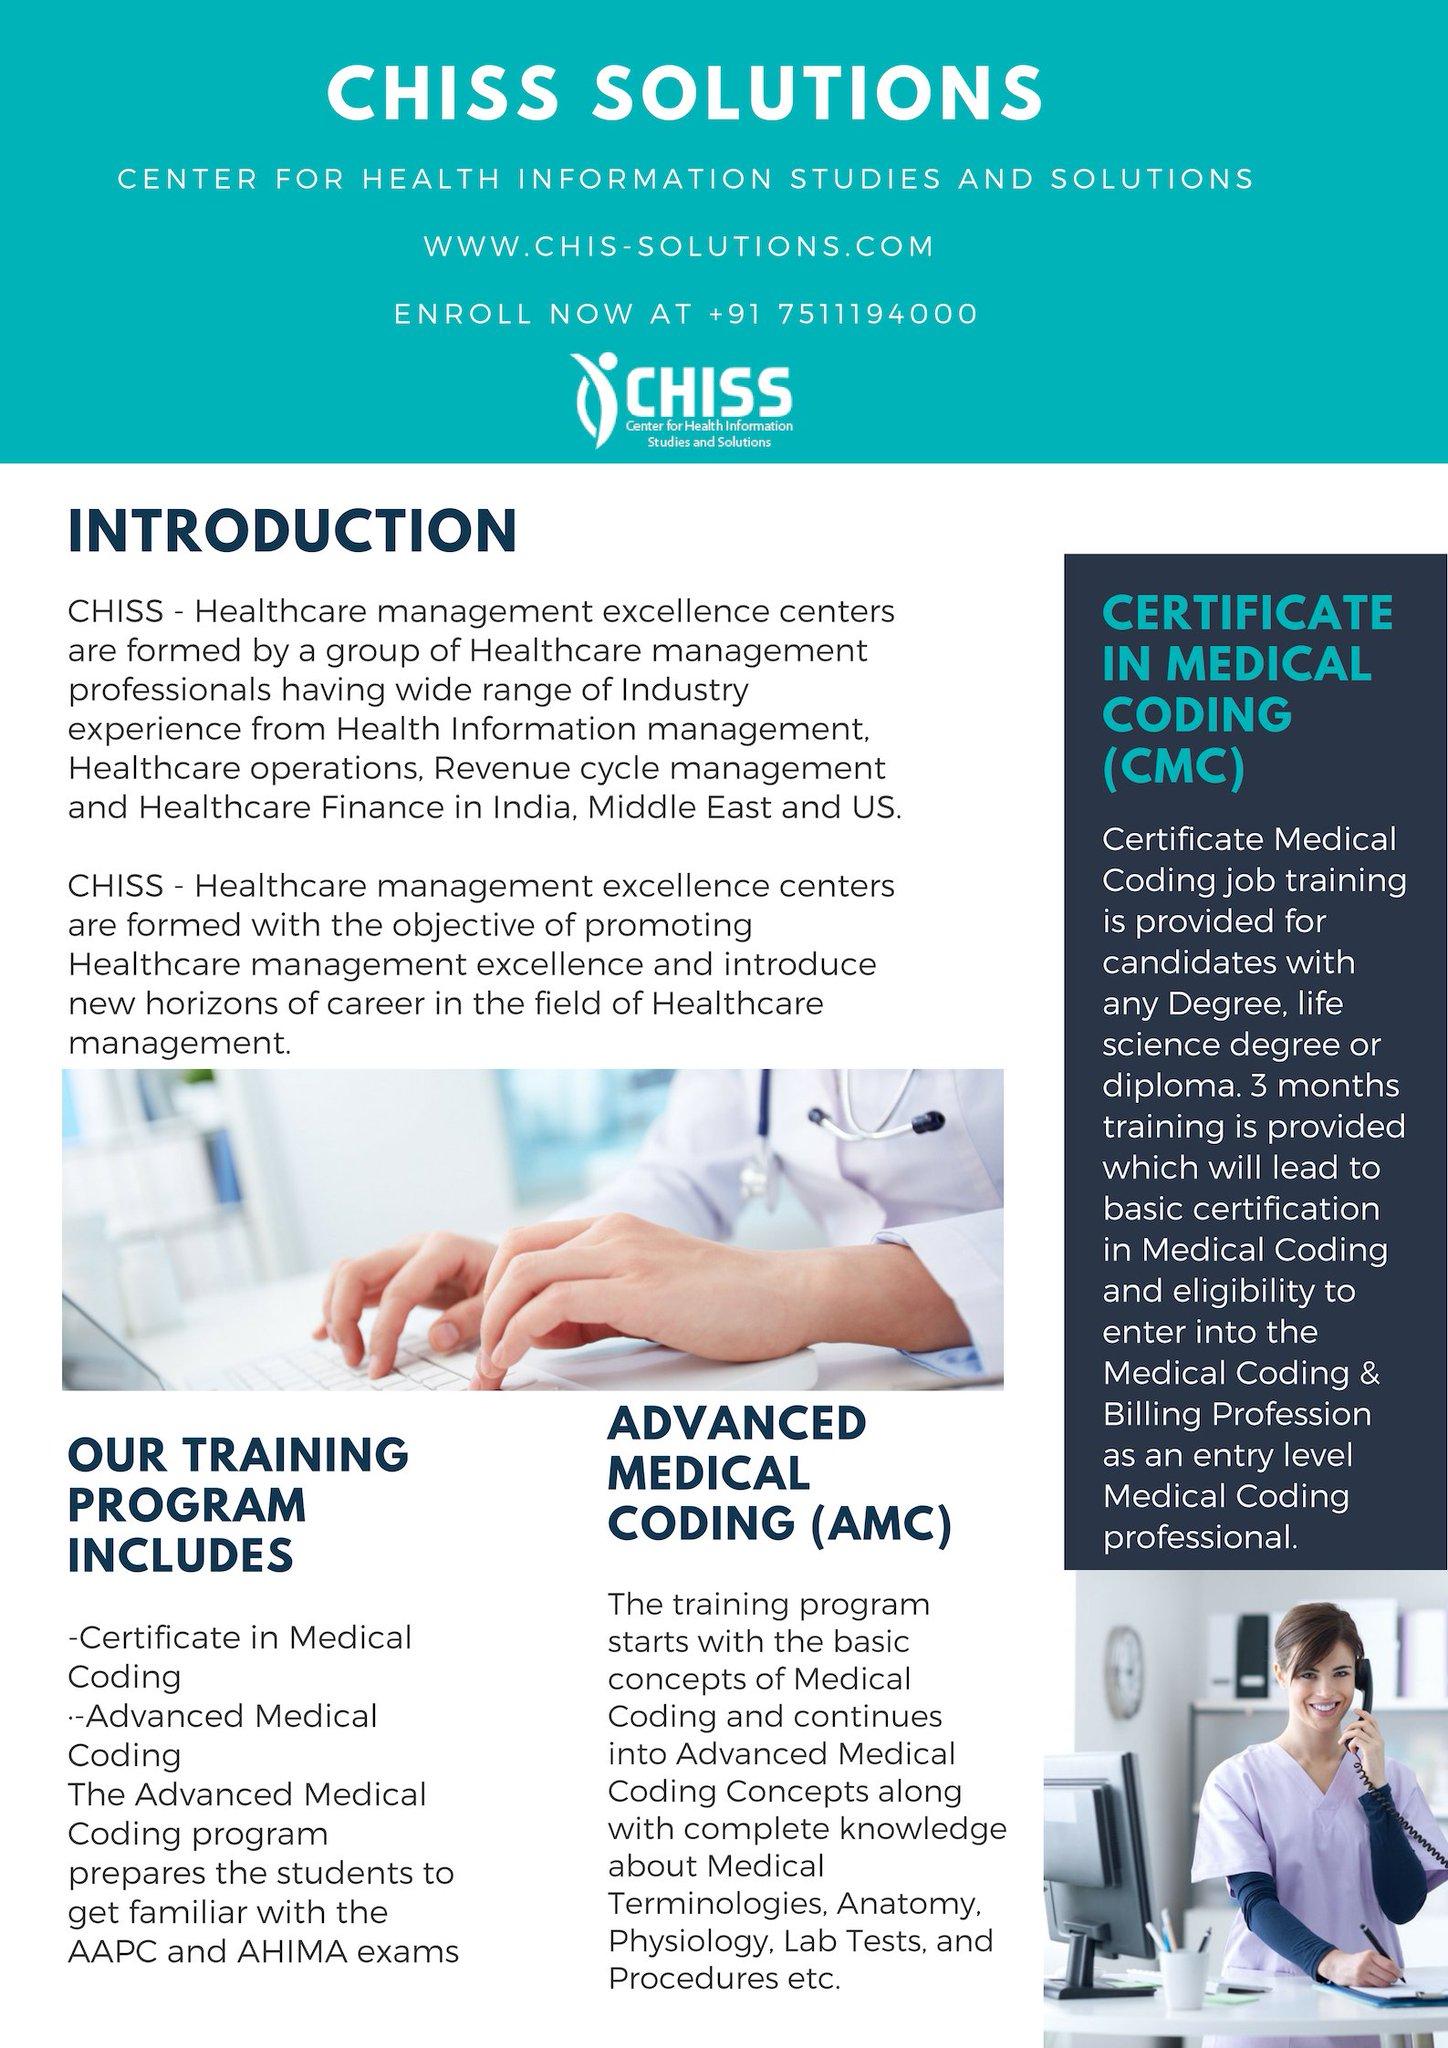 Chiss Center For Health Infomation Studies On Twitter